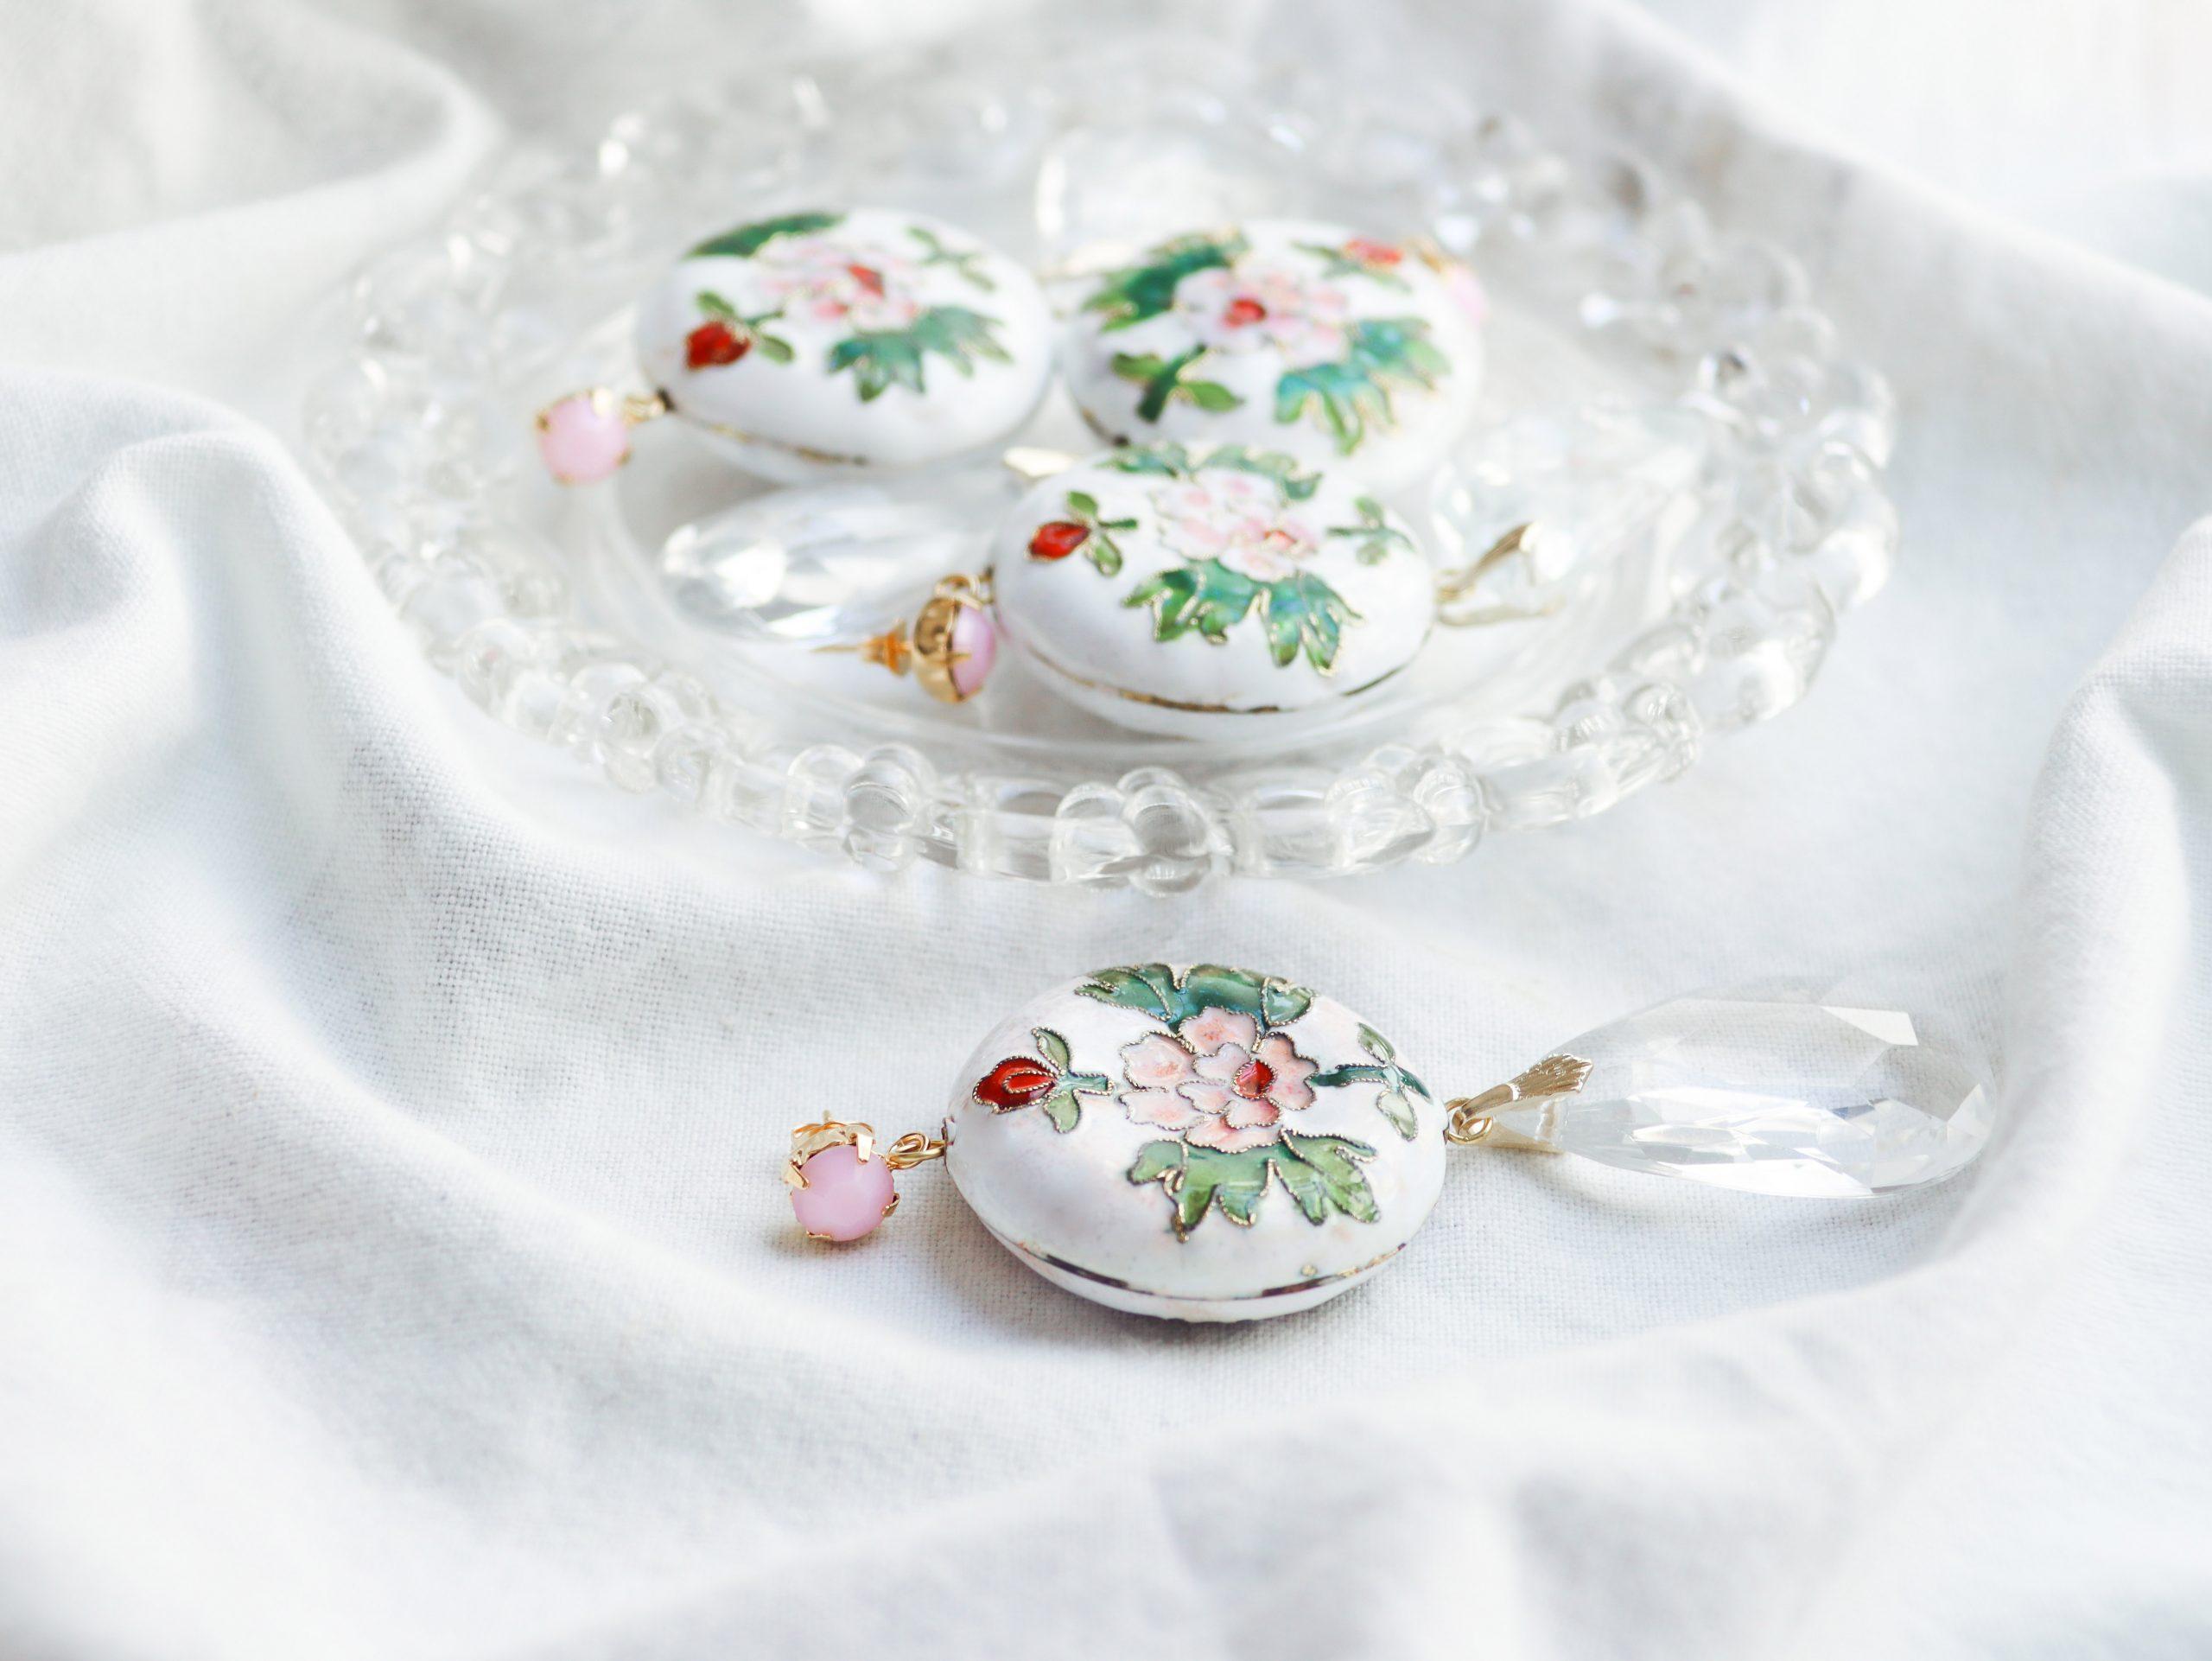 je suis flore, earrings, floral earrings, white earrings, statement earrings, over je suis Flore